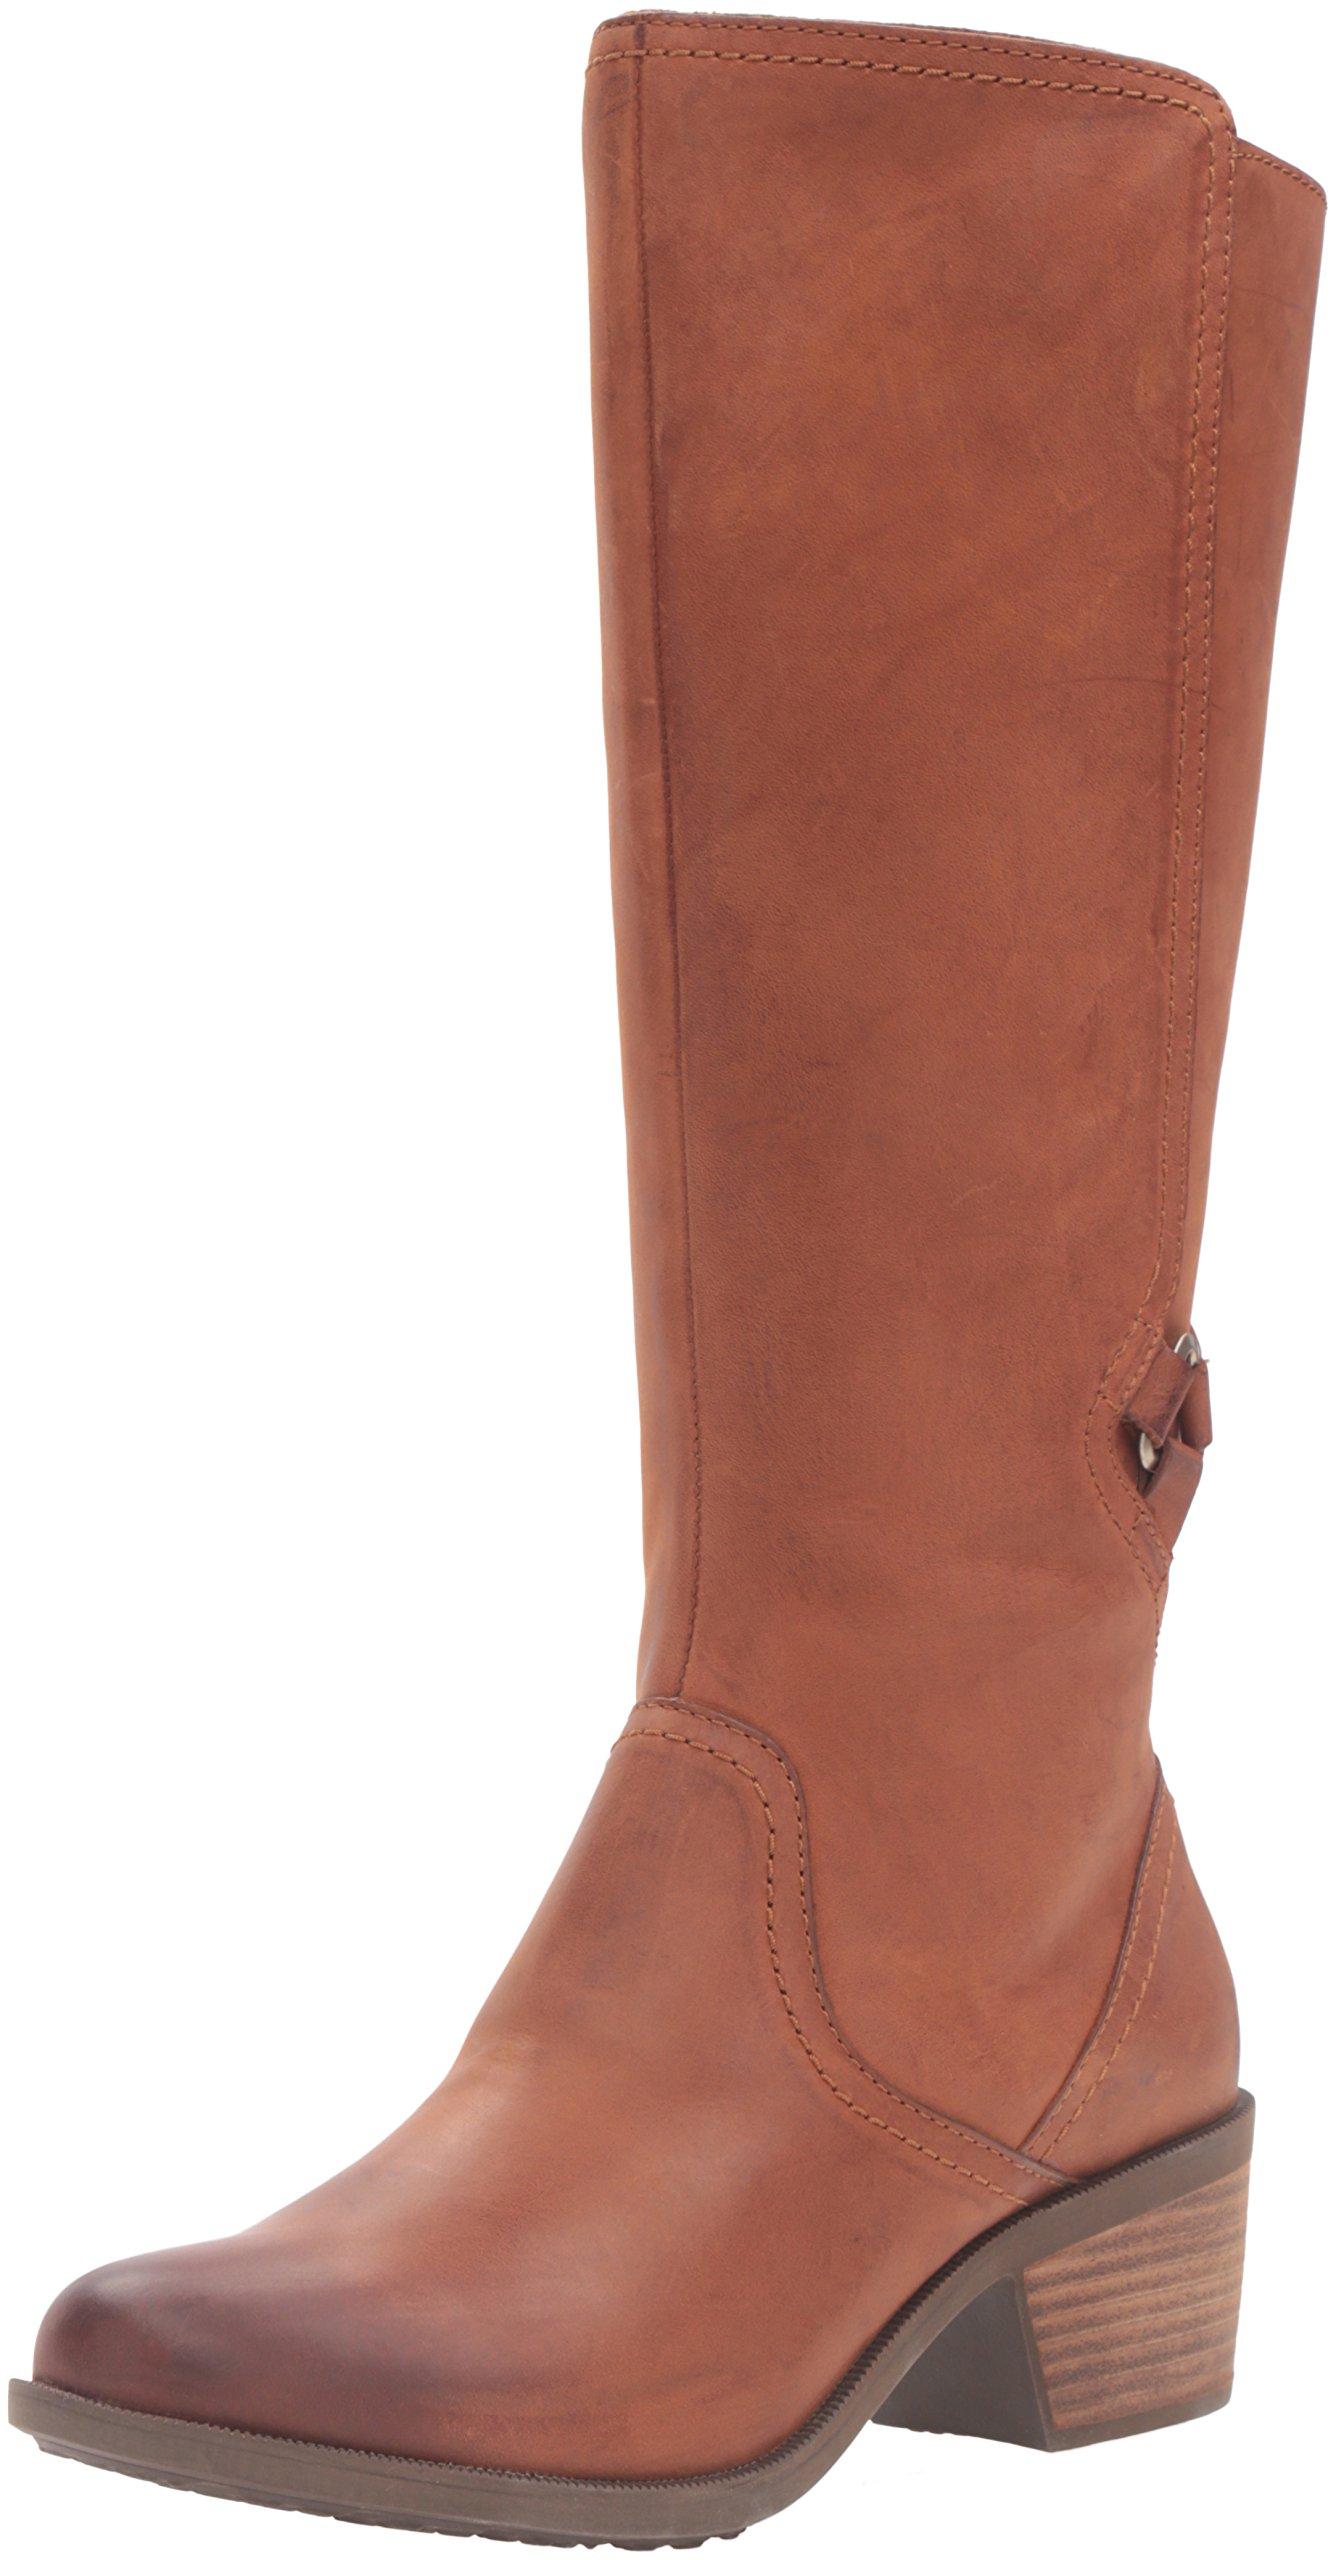 Teva Women's W Foxy Tall Leather Boot,Cognac,7.5 M US